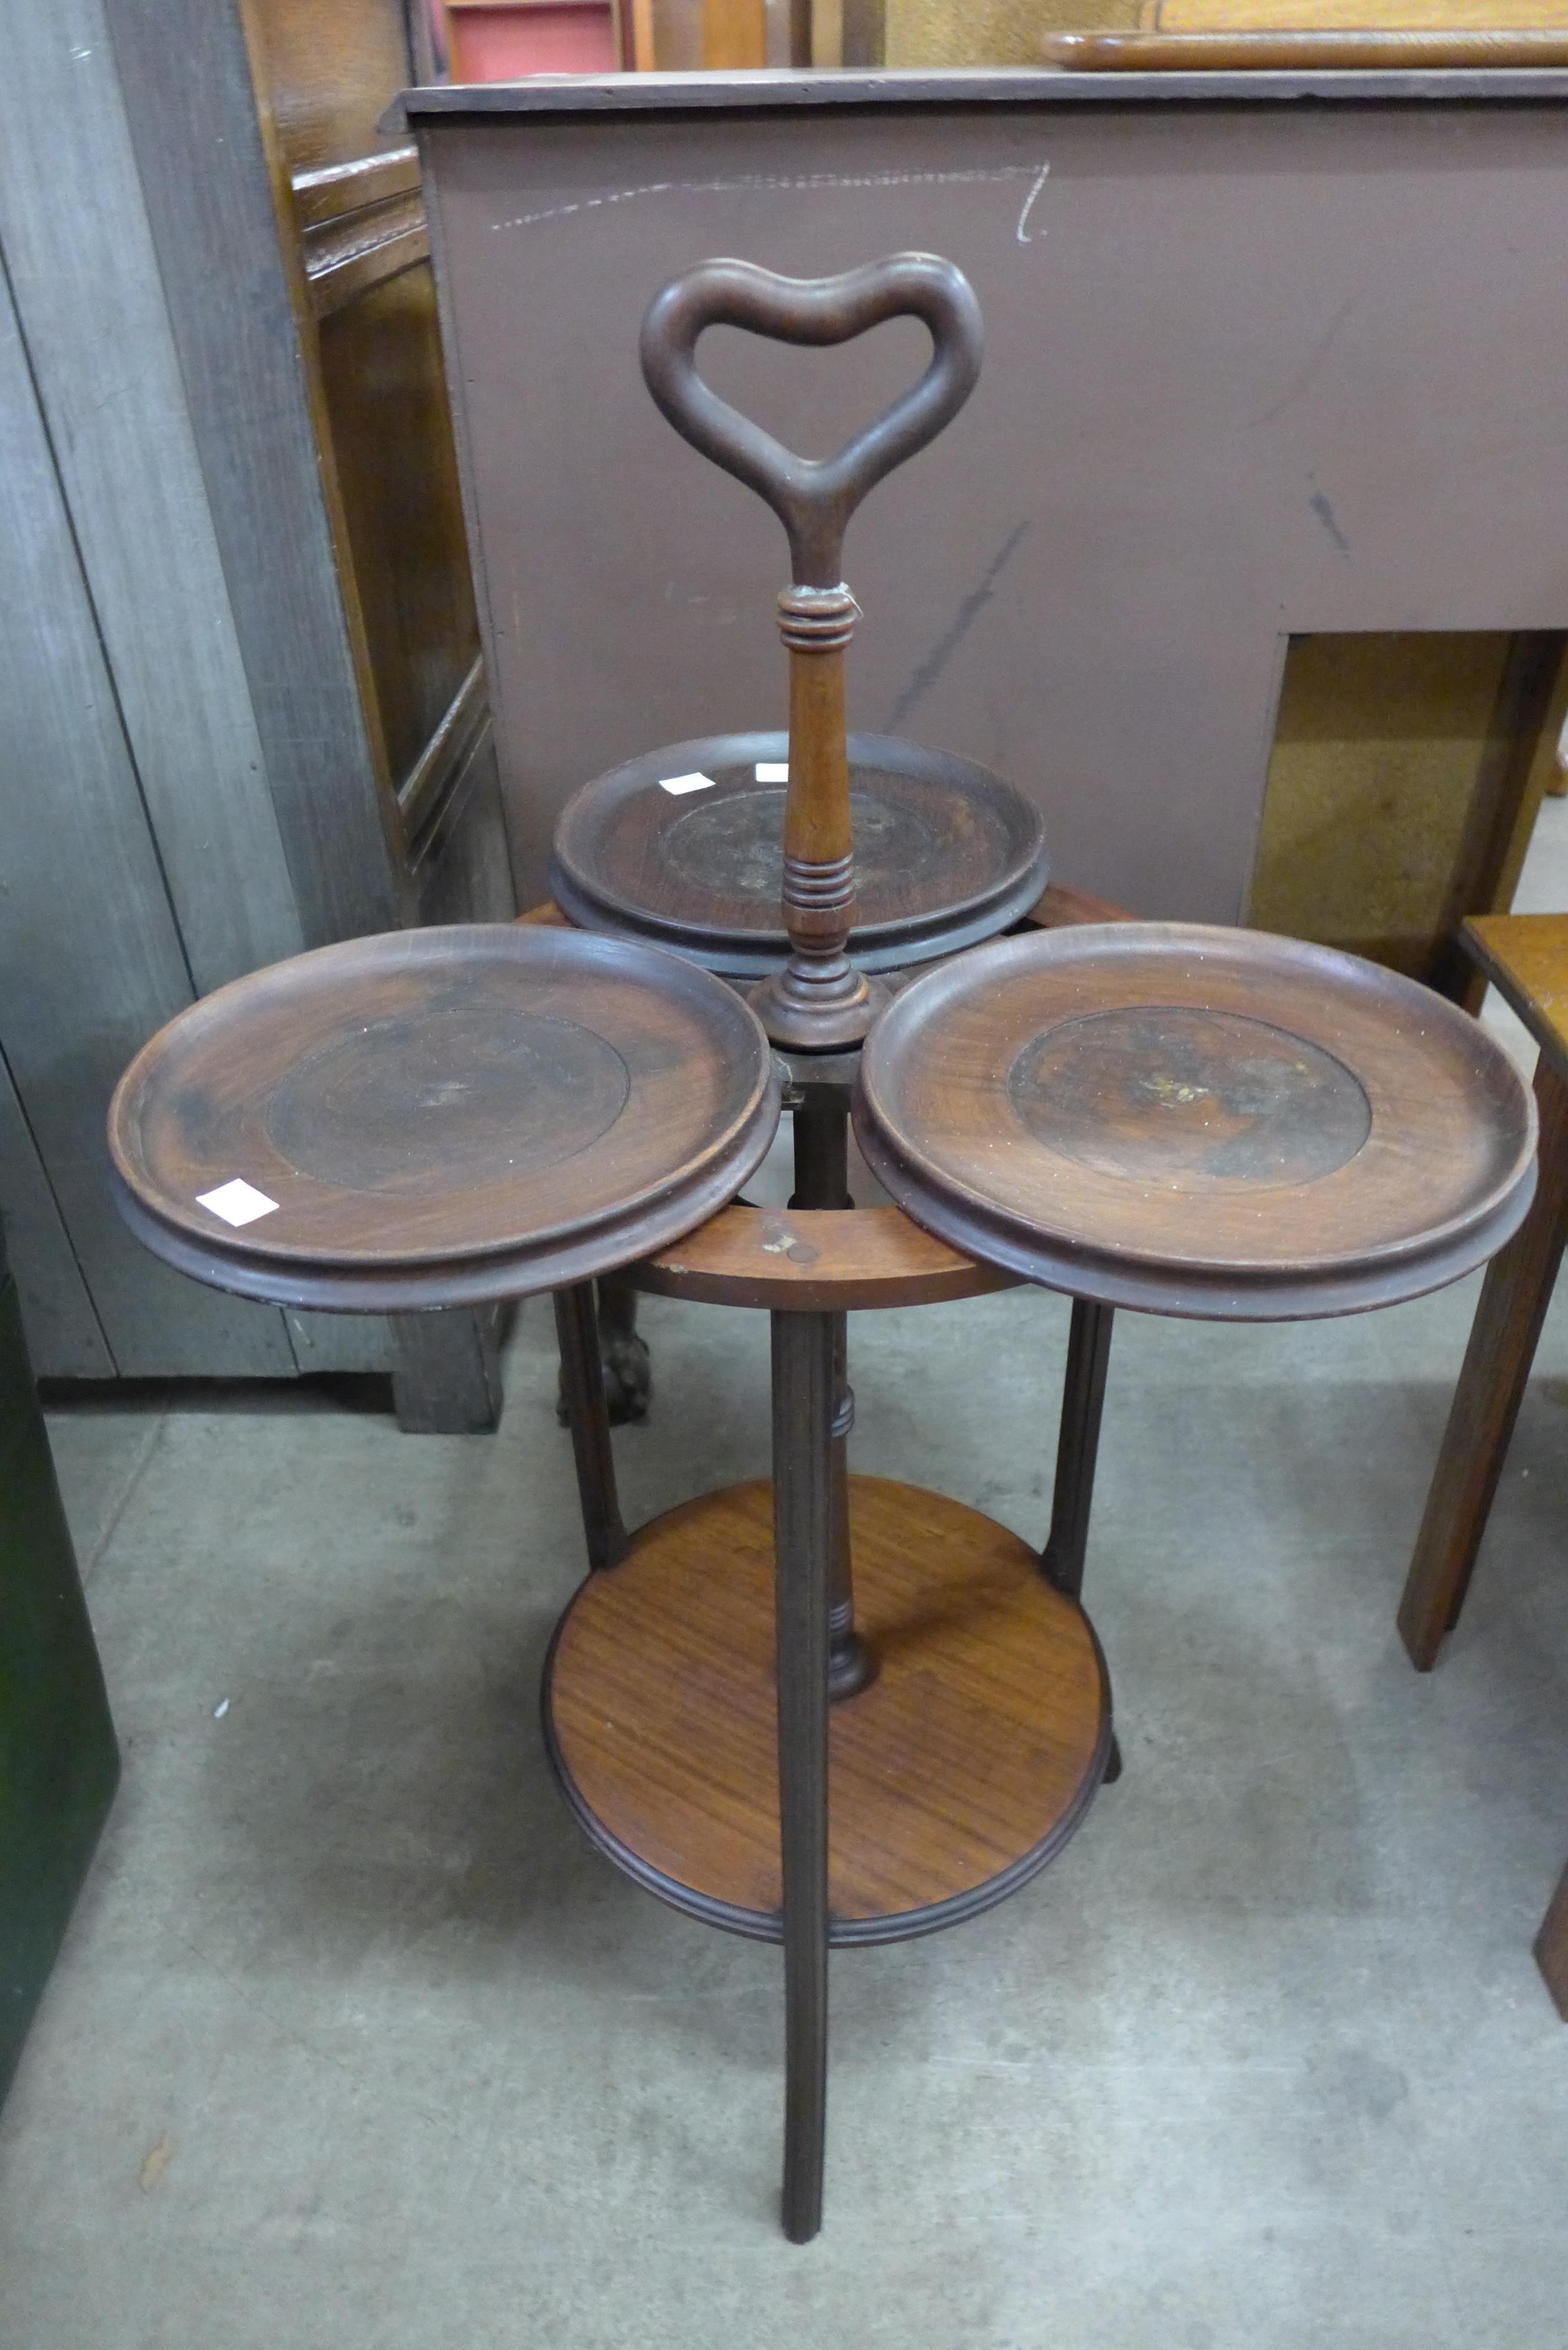 A revolving mahogany cake stand